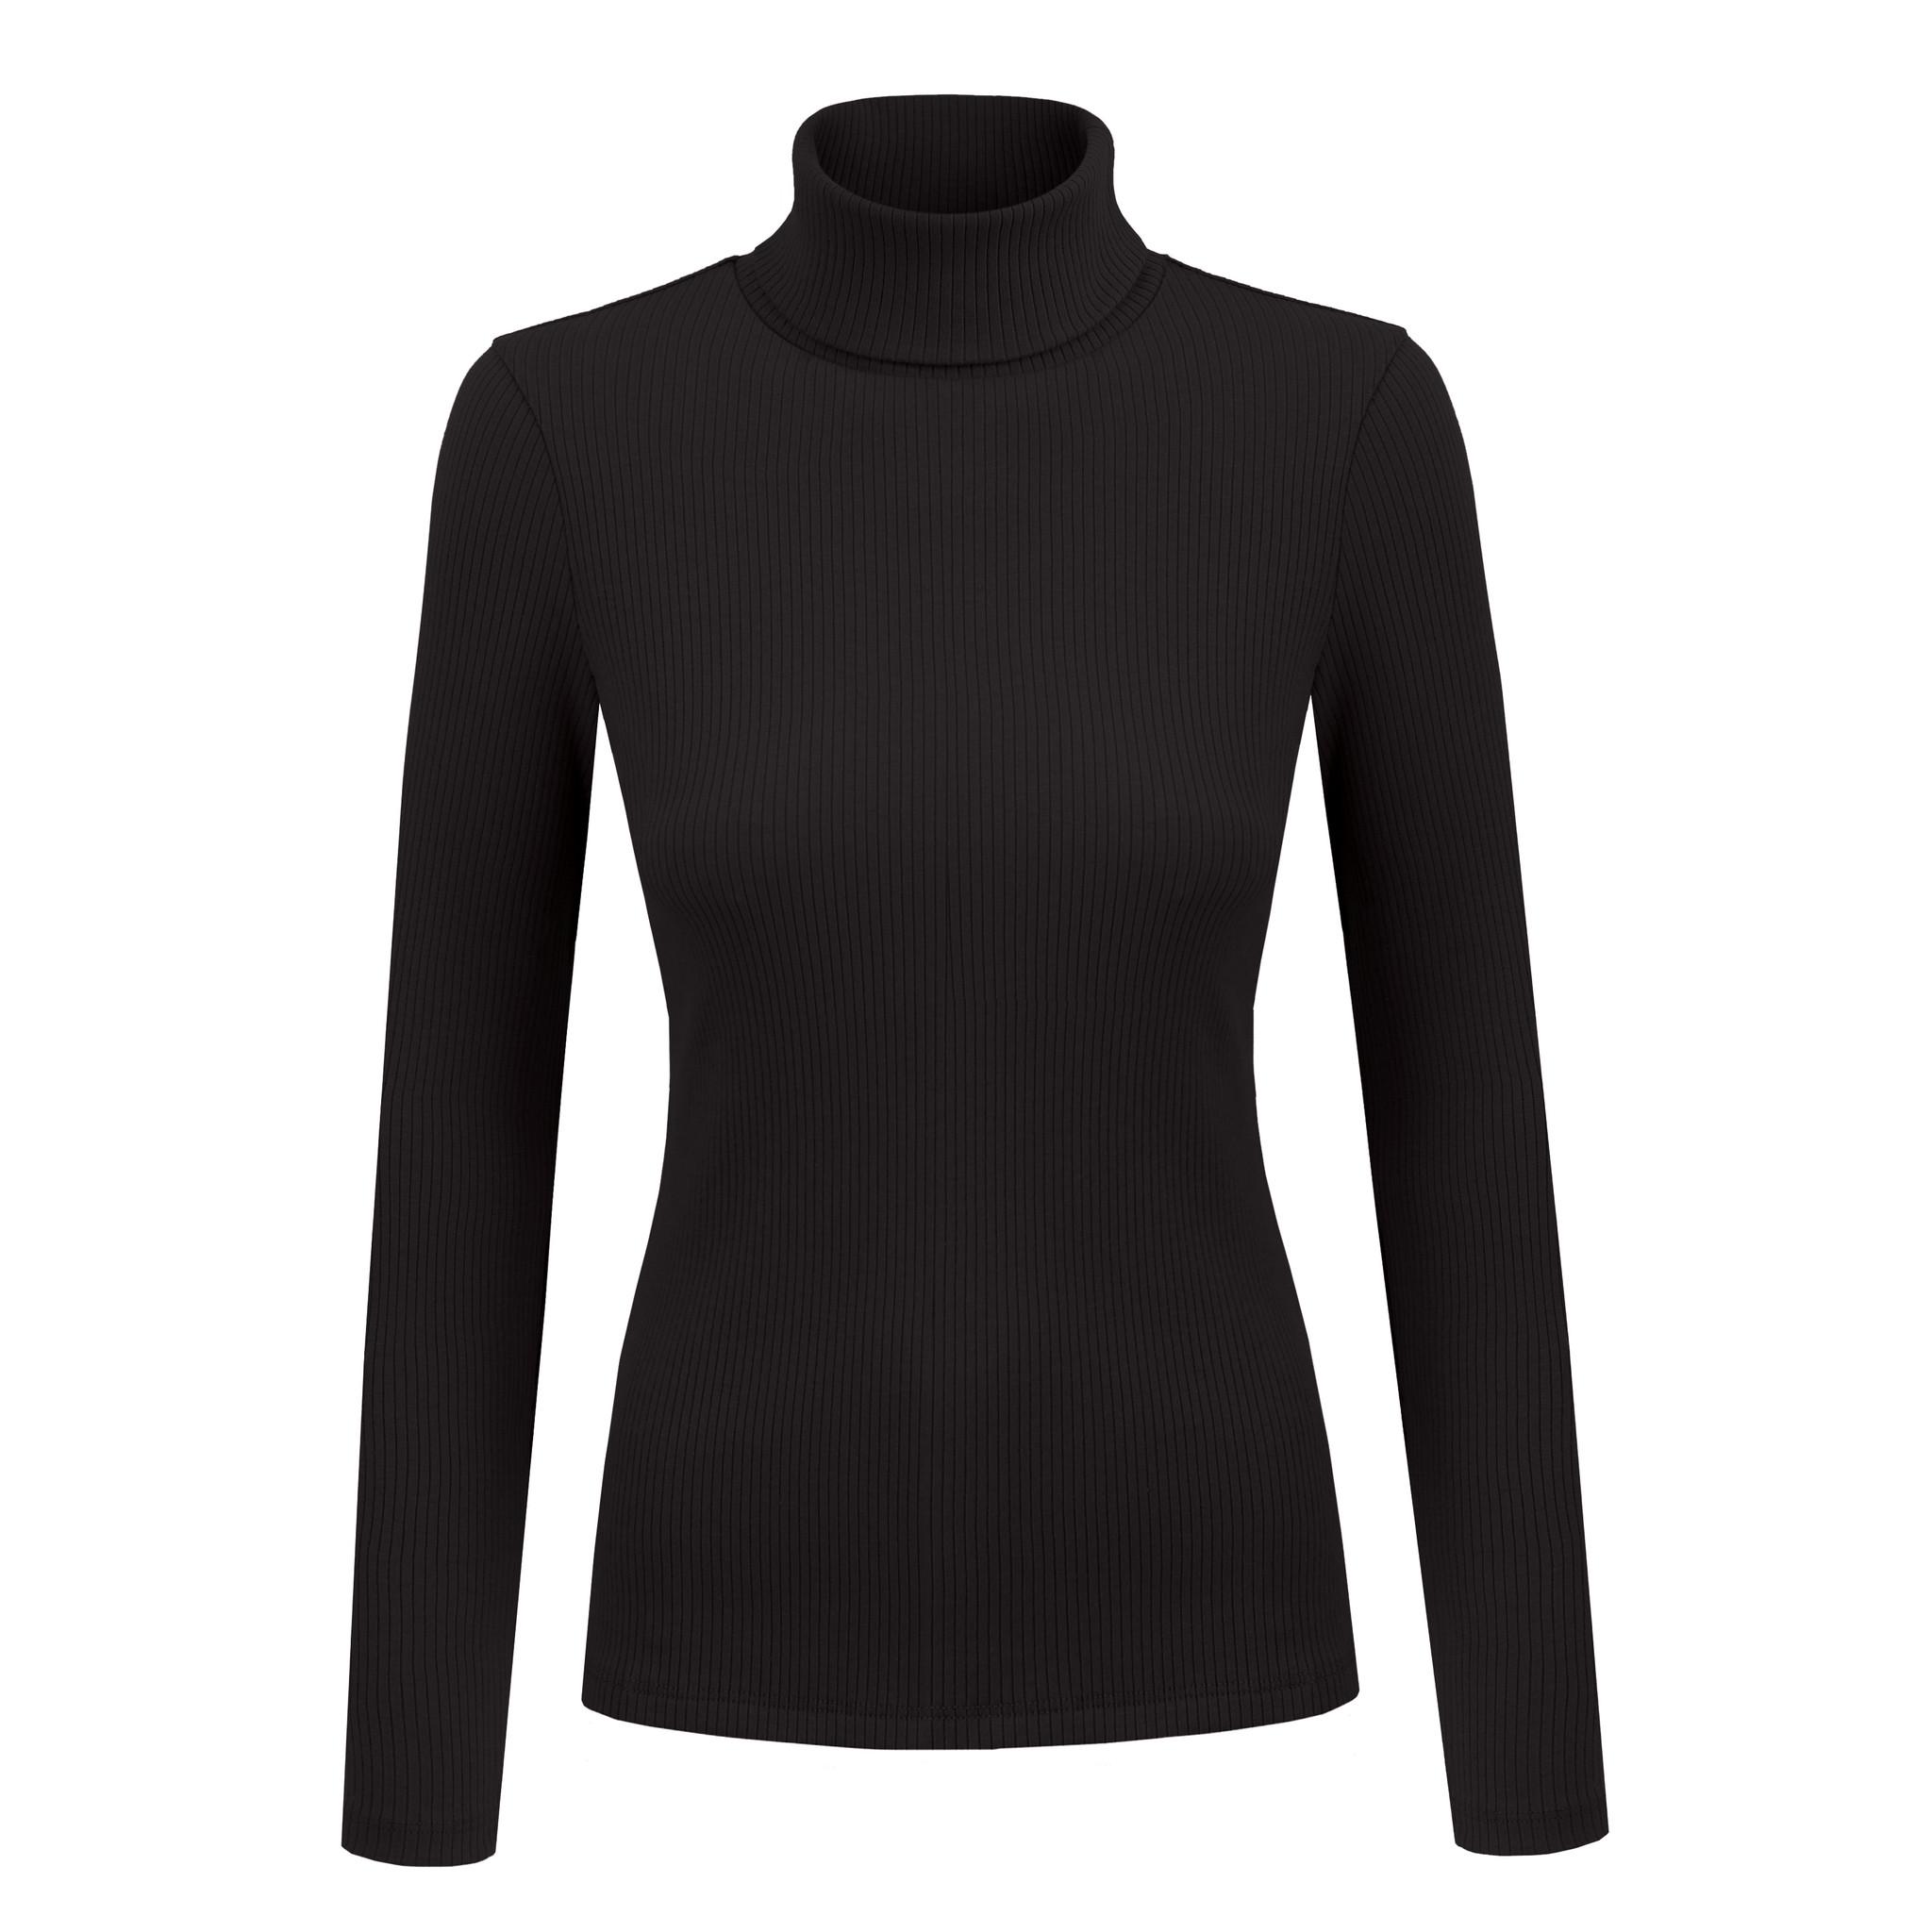 NAGO Organic cotton turtleneck : black | SoBio Beauty Boutique